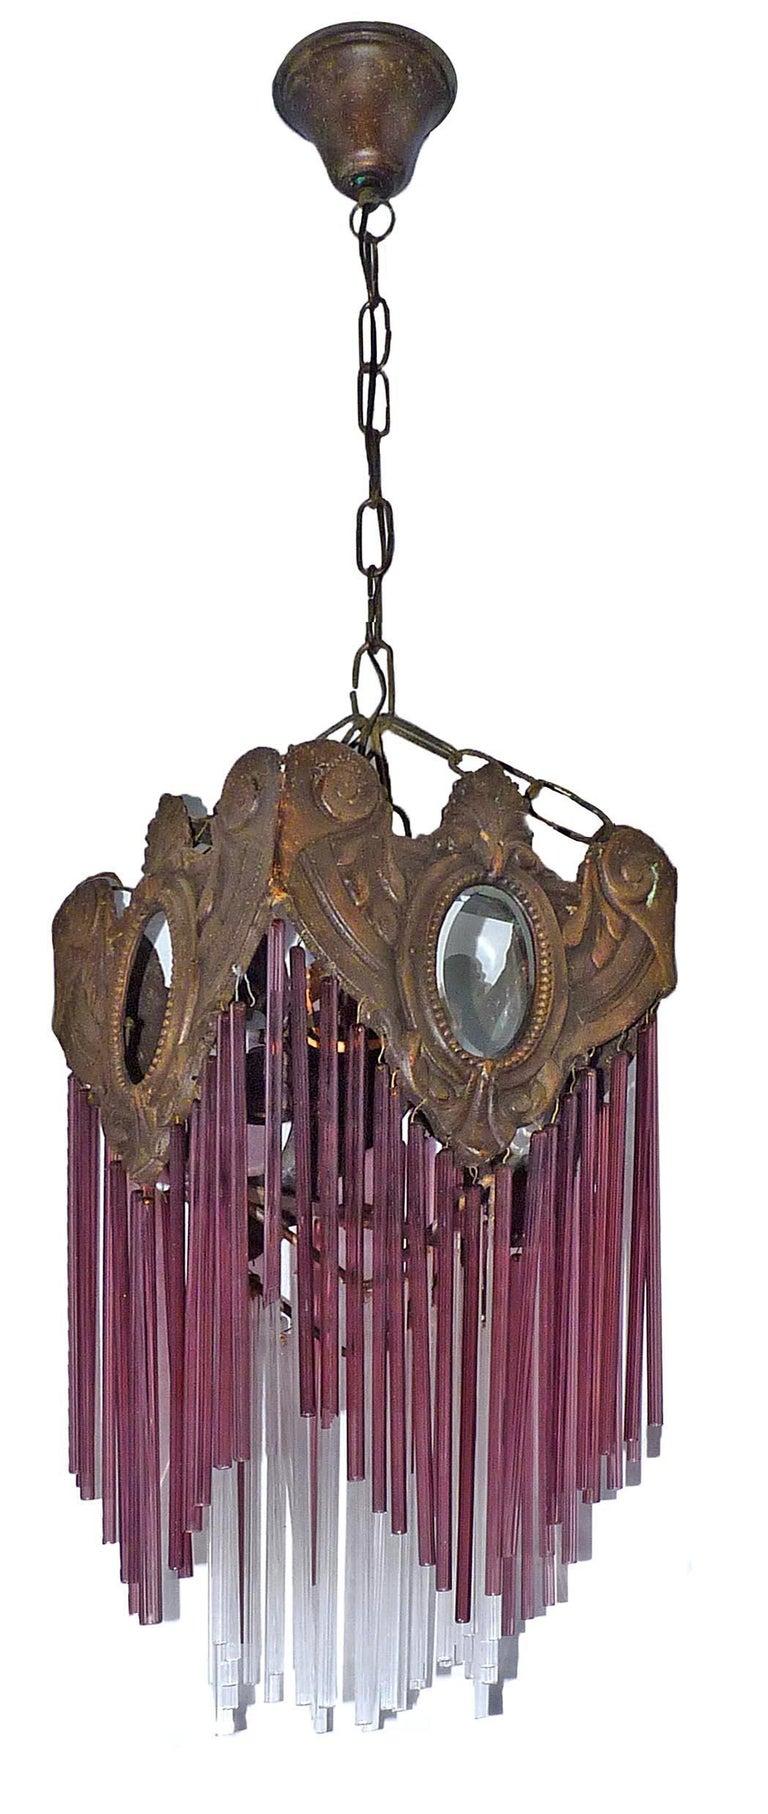 French Art Nouveau Art Deco Bronze and Purple Glass Fringe Chandelier or Lantern For Sale 1